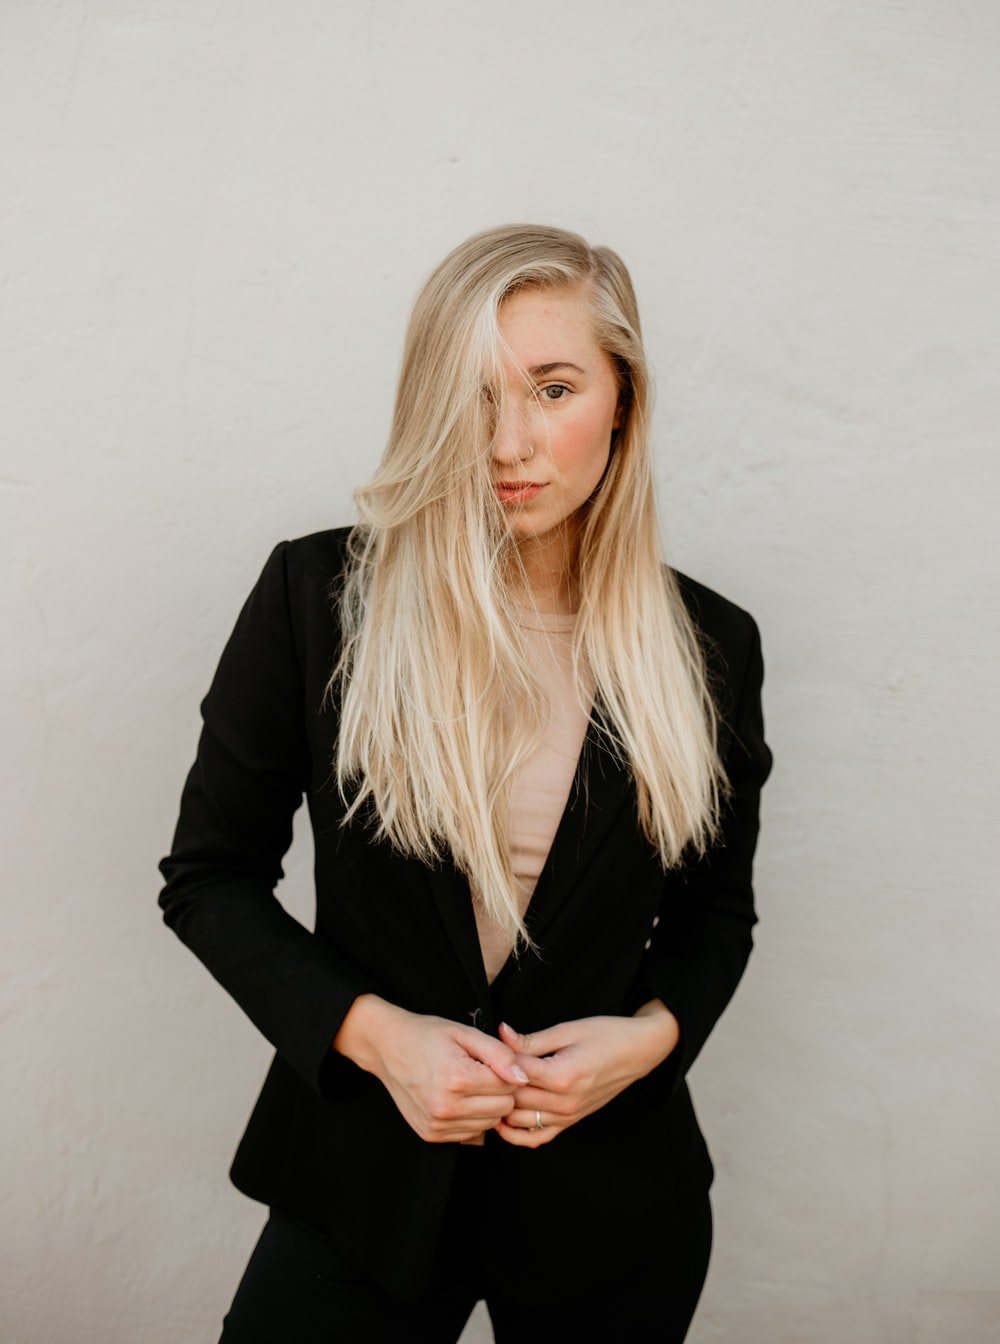 woman wearing black blazer standing